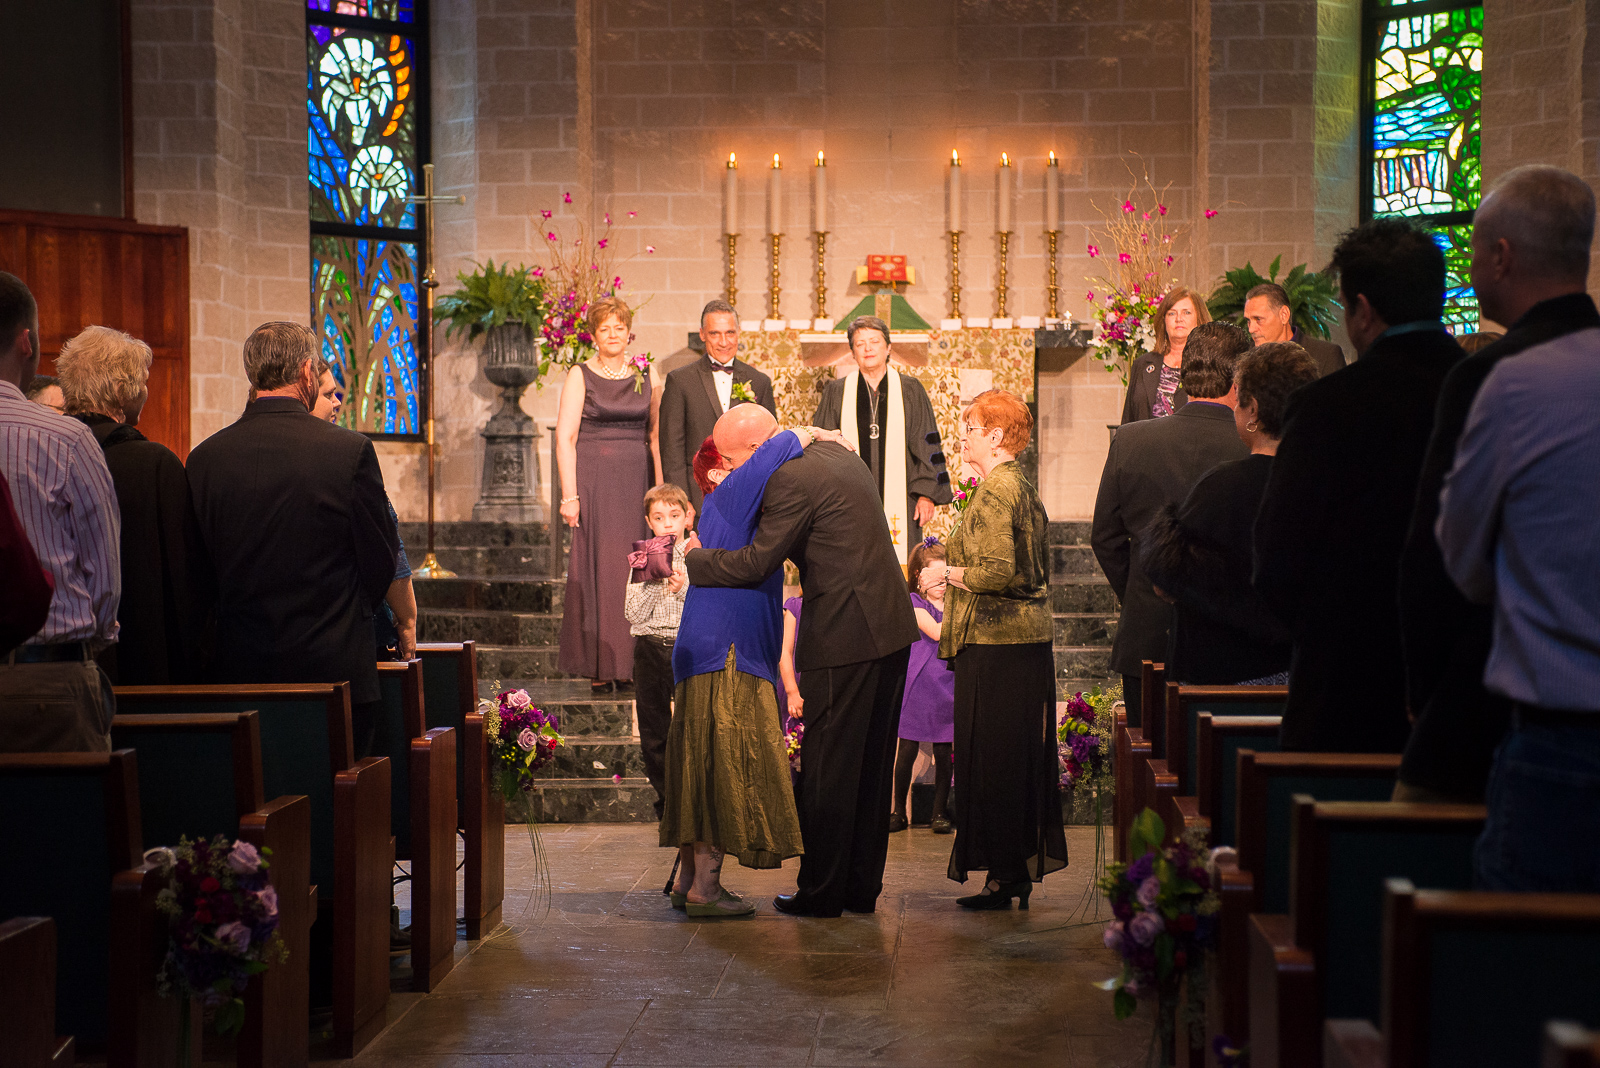 Michael-Napier-Weddings-Ludwig-Guilbeau Wedding-20 (11).jpg